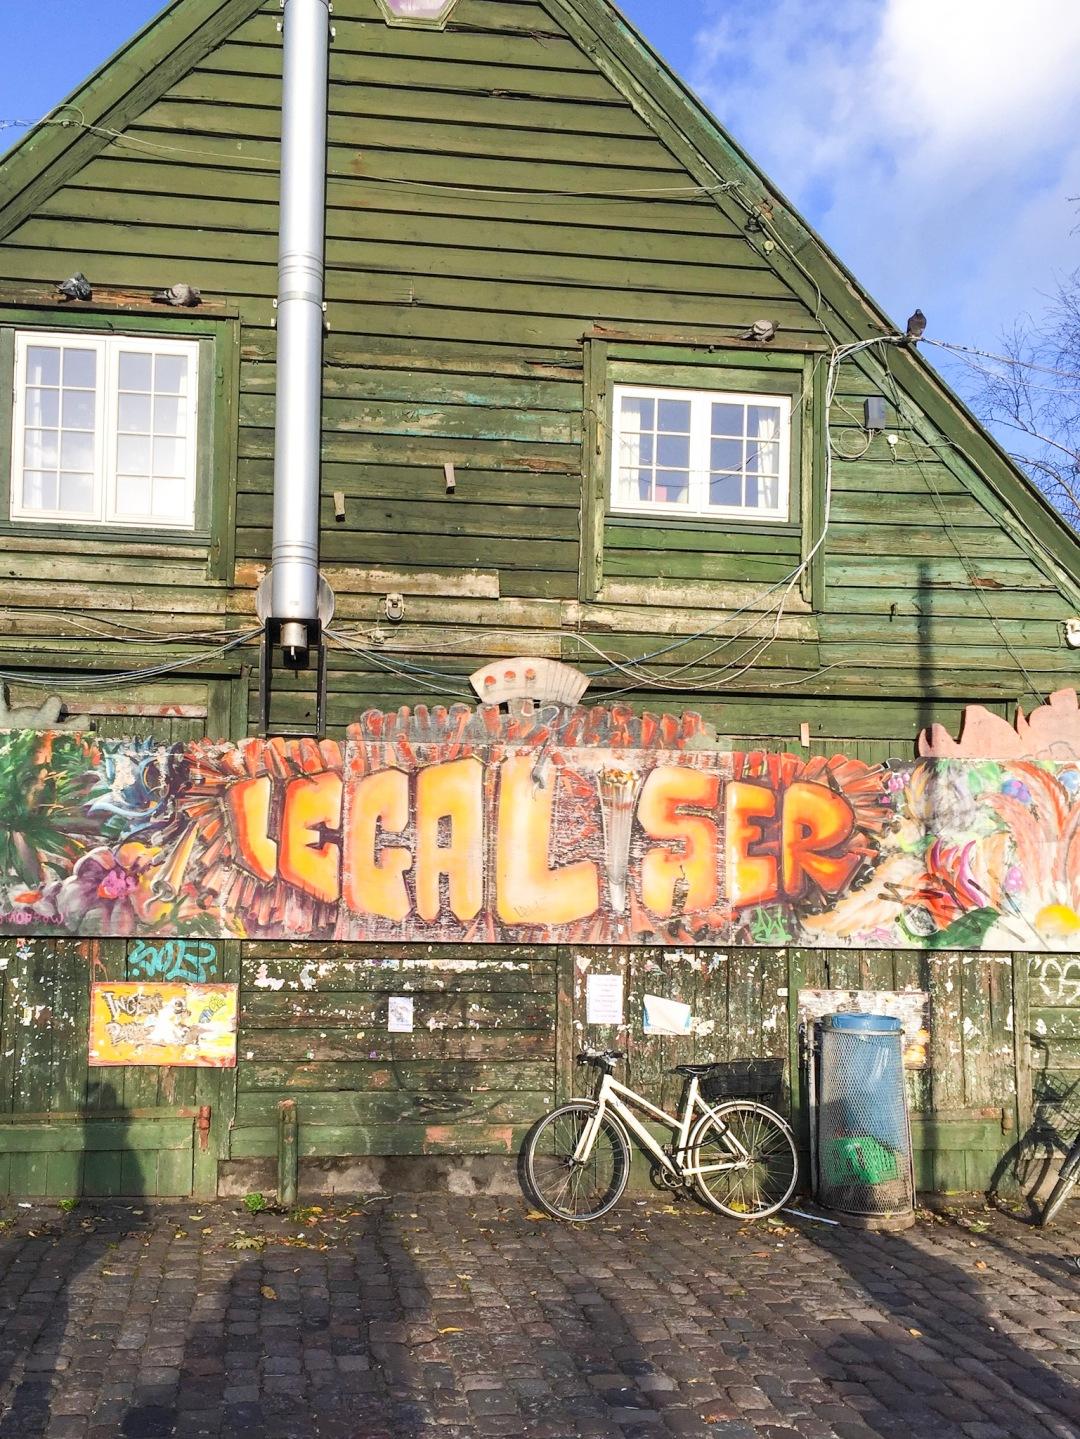 Freetown Christiania in Copenhagen cannabis booths